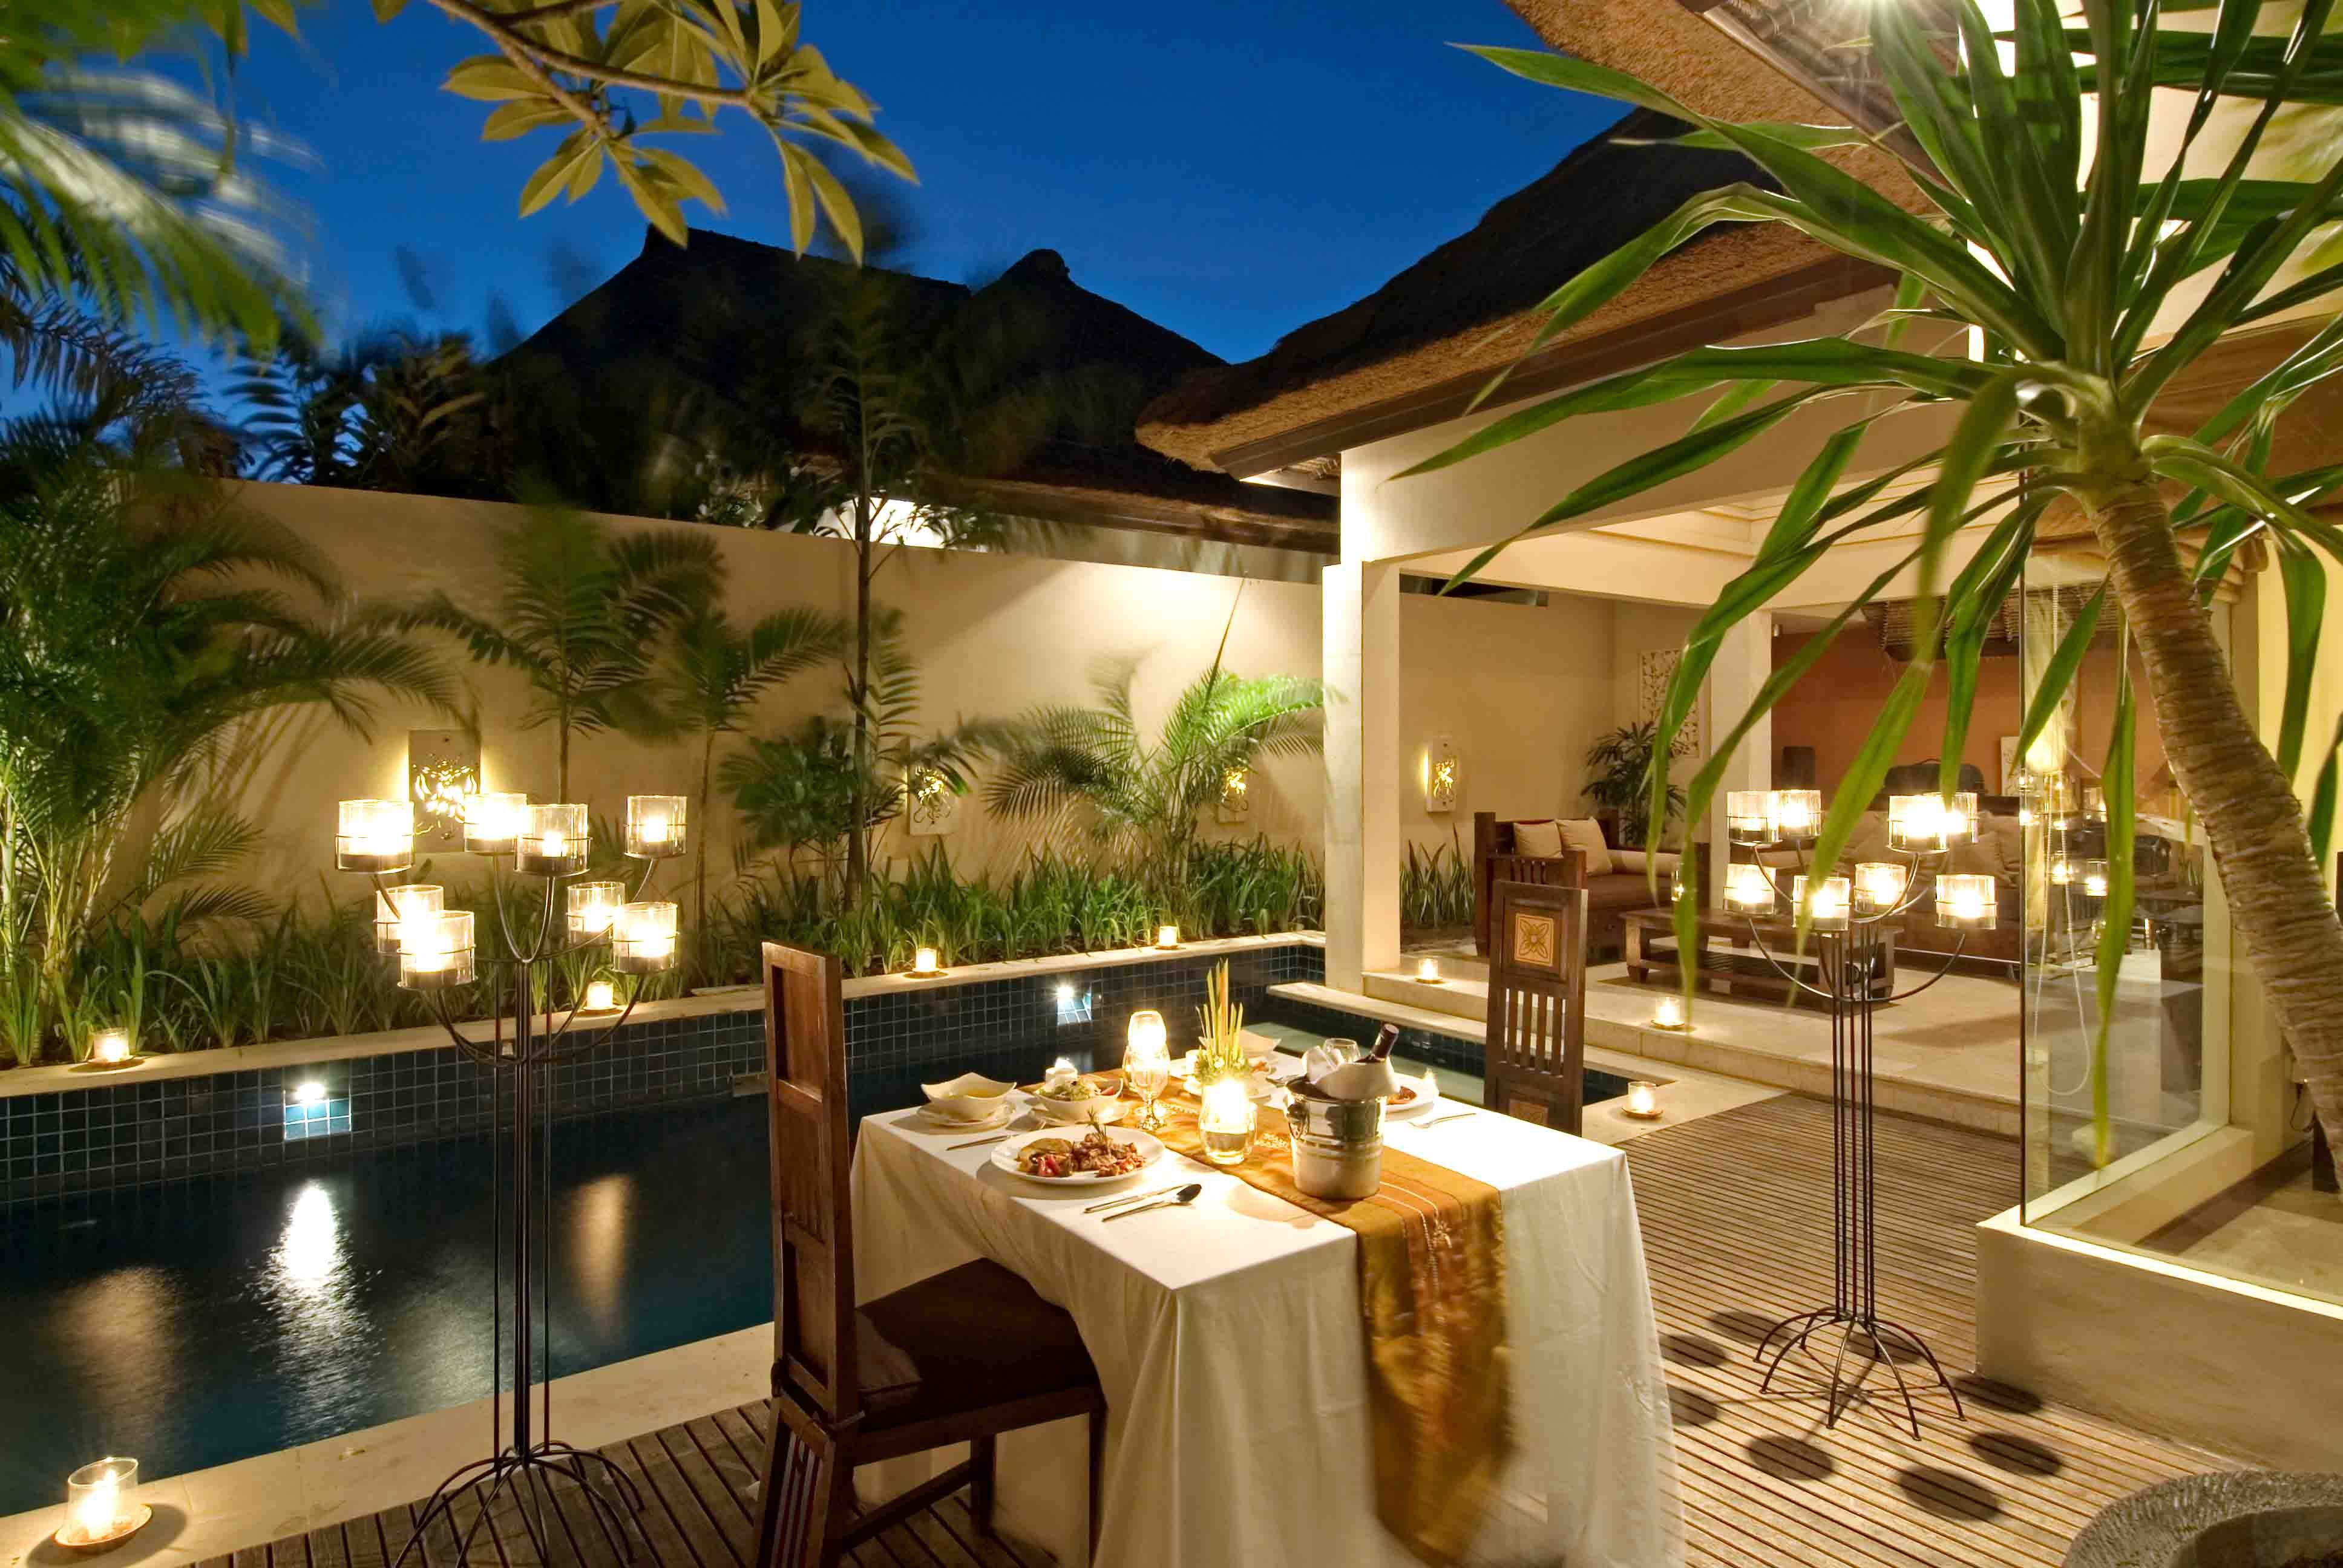 Bali interior design aston bhavana villas seminyak bali for Pool design bali